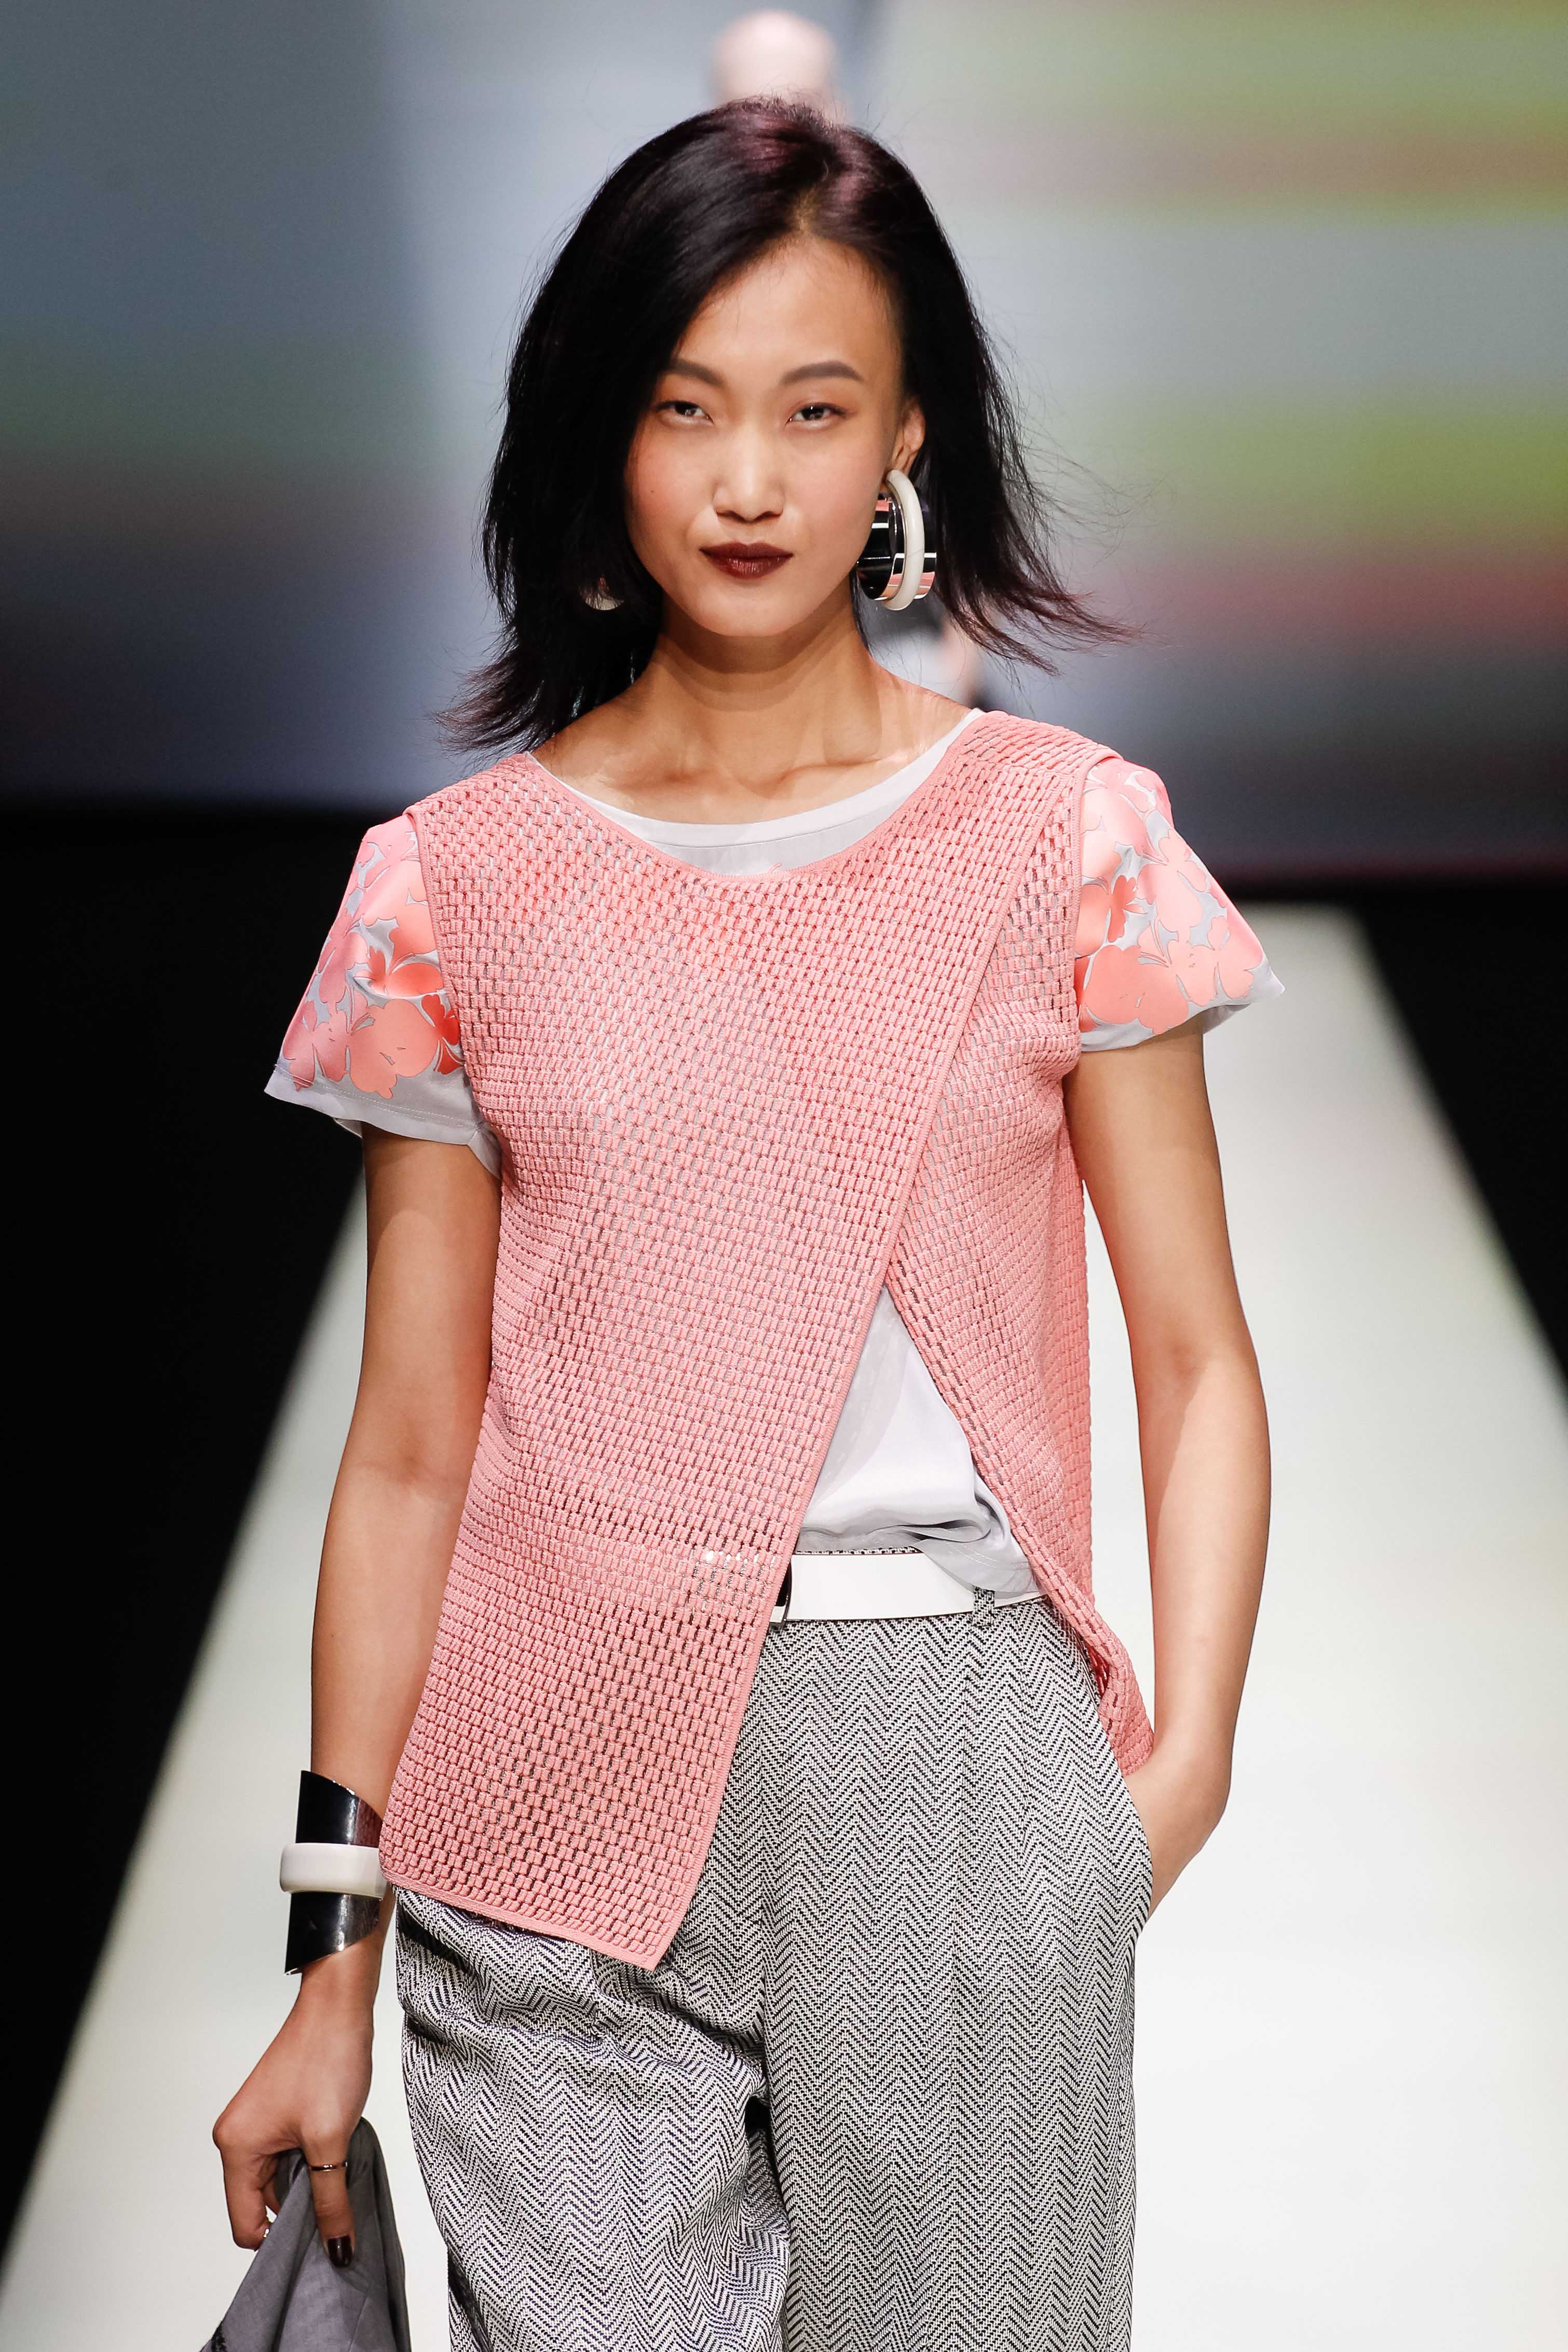 short hairstyles for women in 2016 asymmetrical